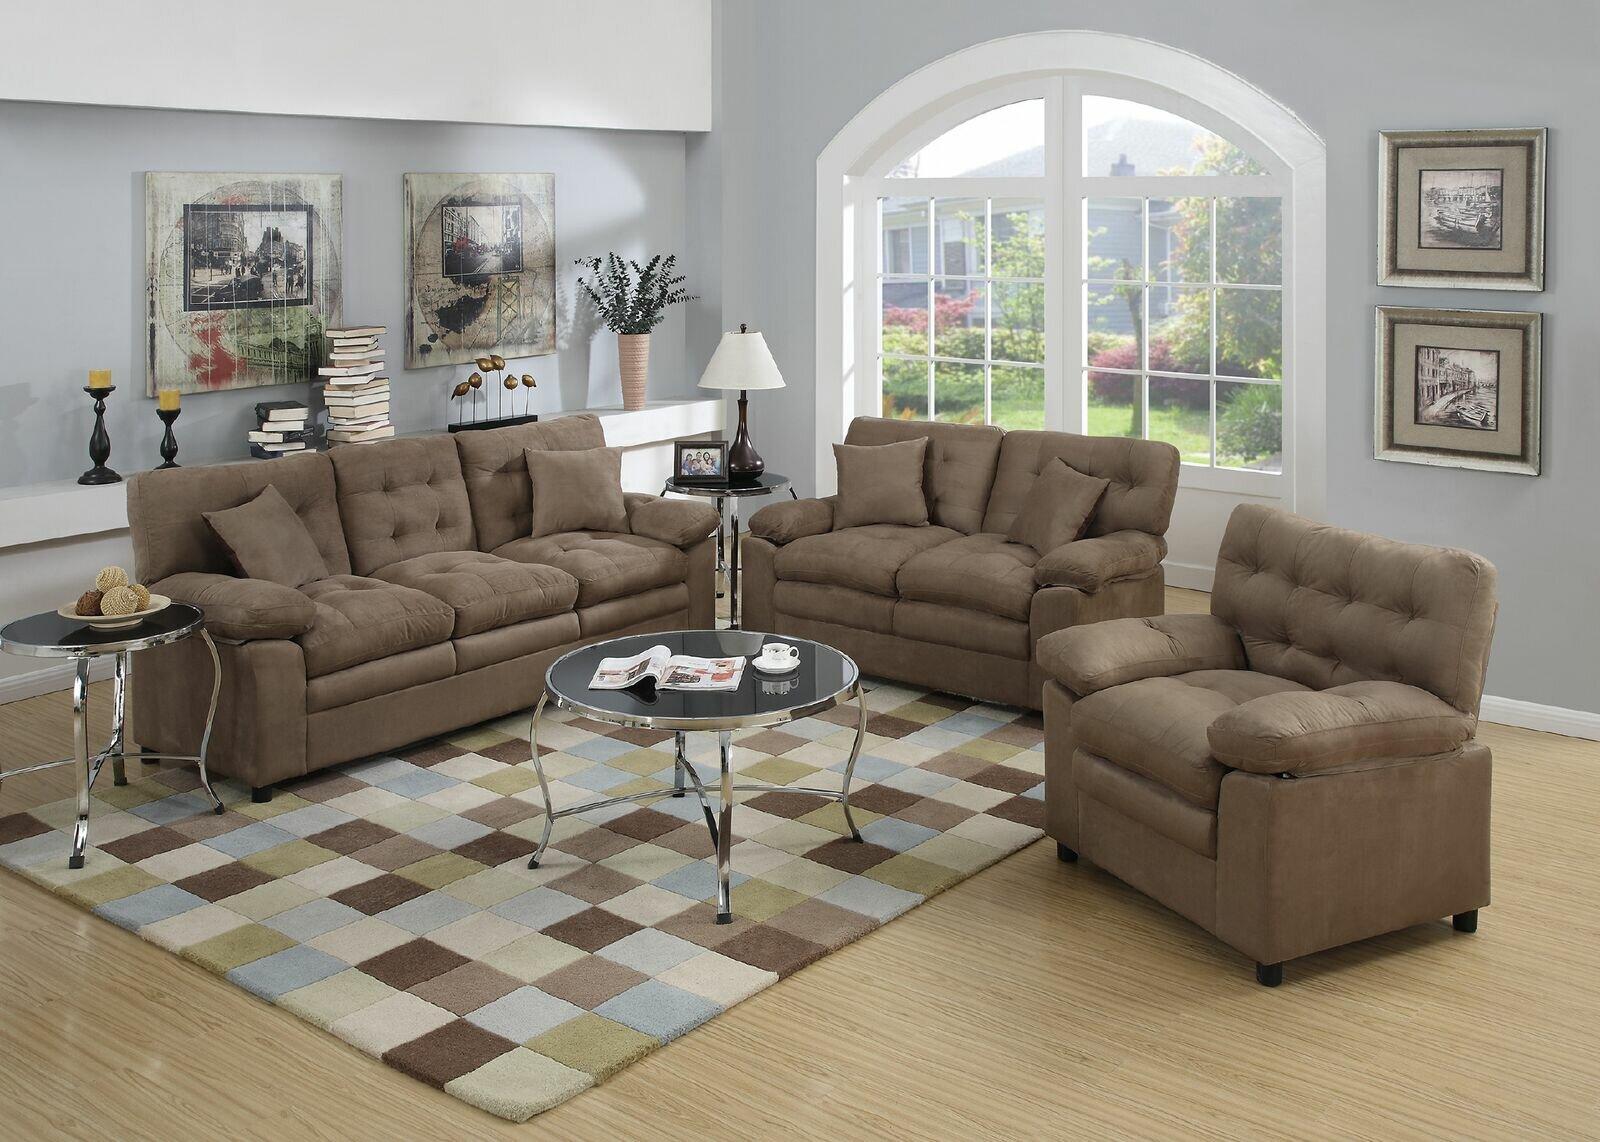 Hayleigh 3 Piece Living Room Set